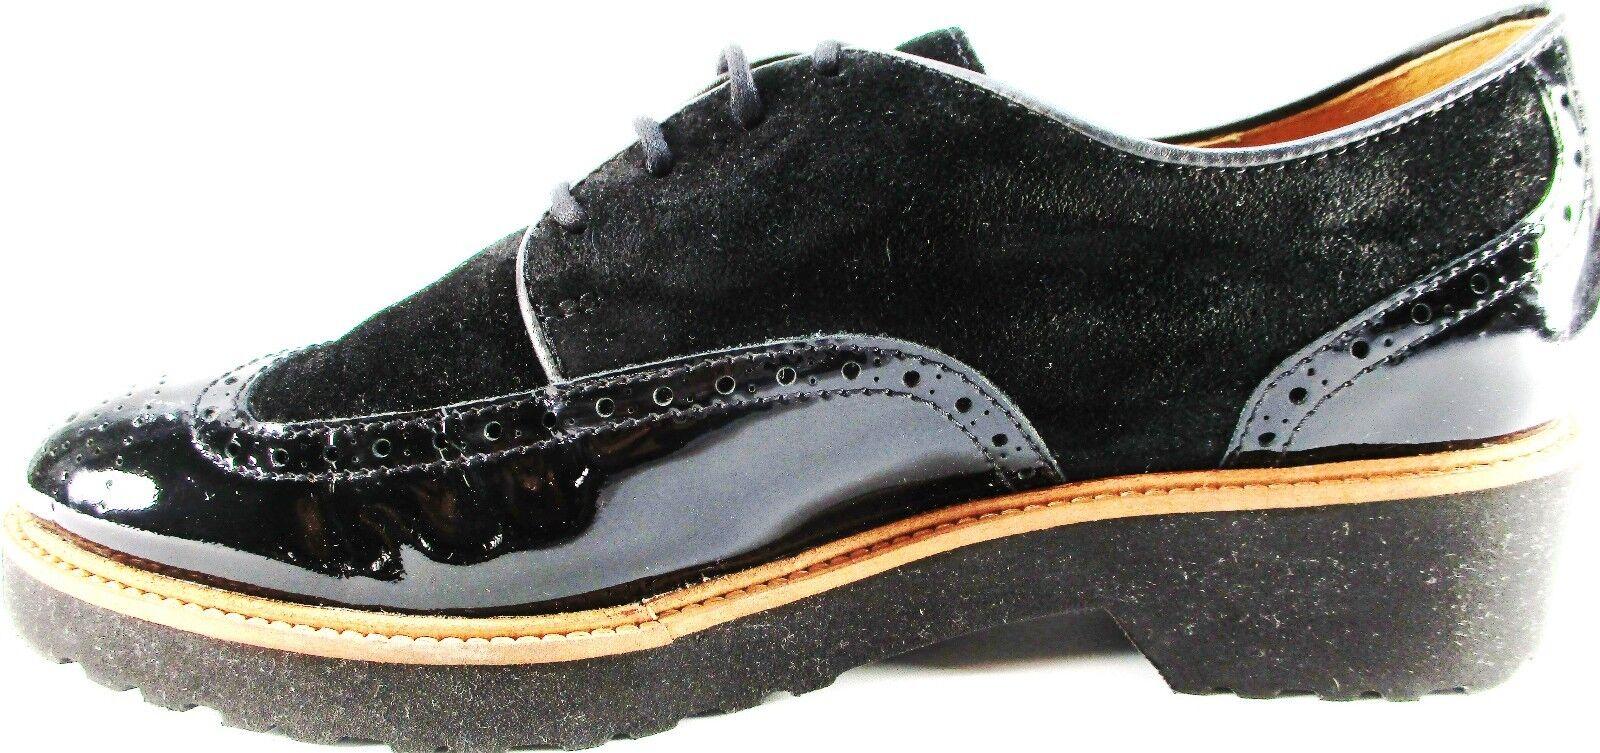 Rizzo euro mujeres punta del ala zapatos euro Rizzo 36 Charol Negro Suela De Goma Espuma 214beb